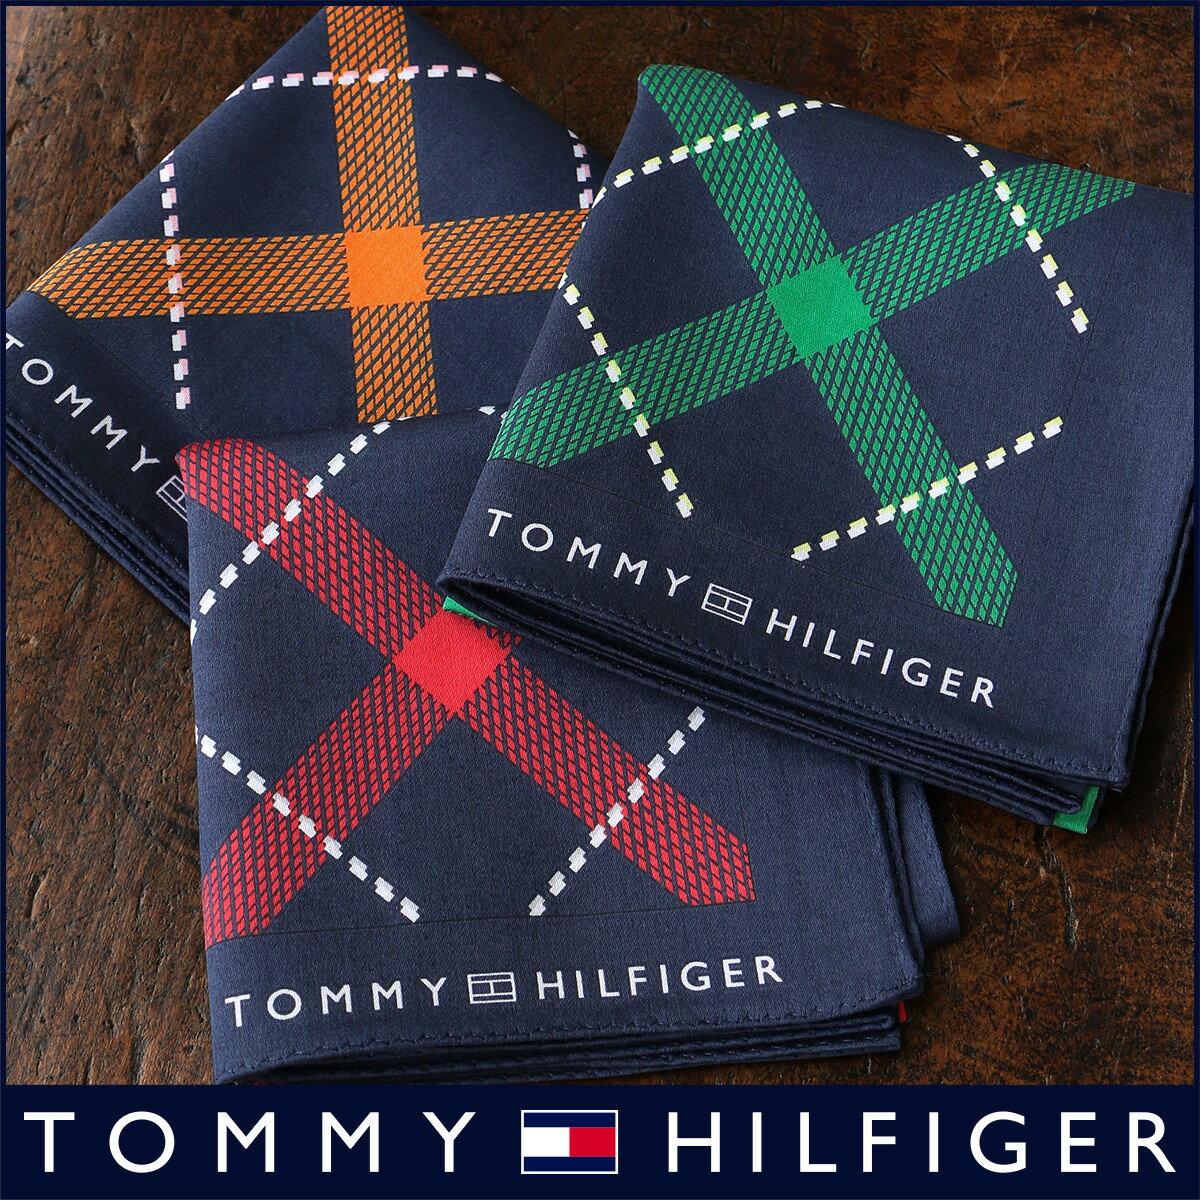 TOMMY HILFIGER|トミーヒルフィガー 無料 トミー ブランド ラッピング OKバイアスチェック柄 綿100% ハンカチ2582-116プレゼント 誕生日 ギフト 贈答品 お祝いポイント10倍